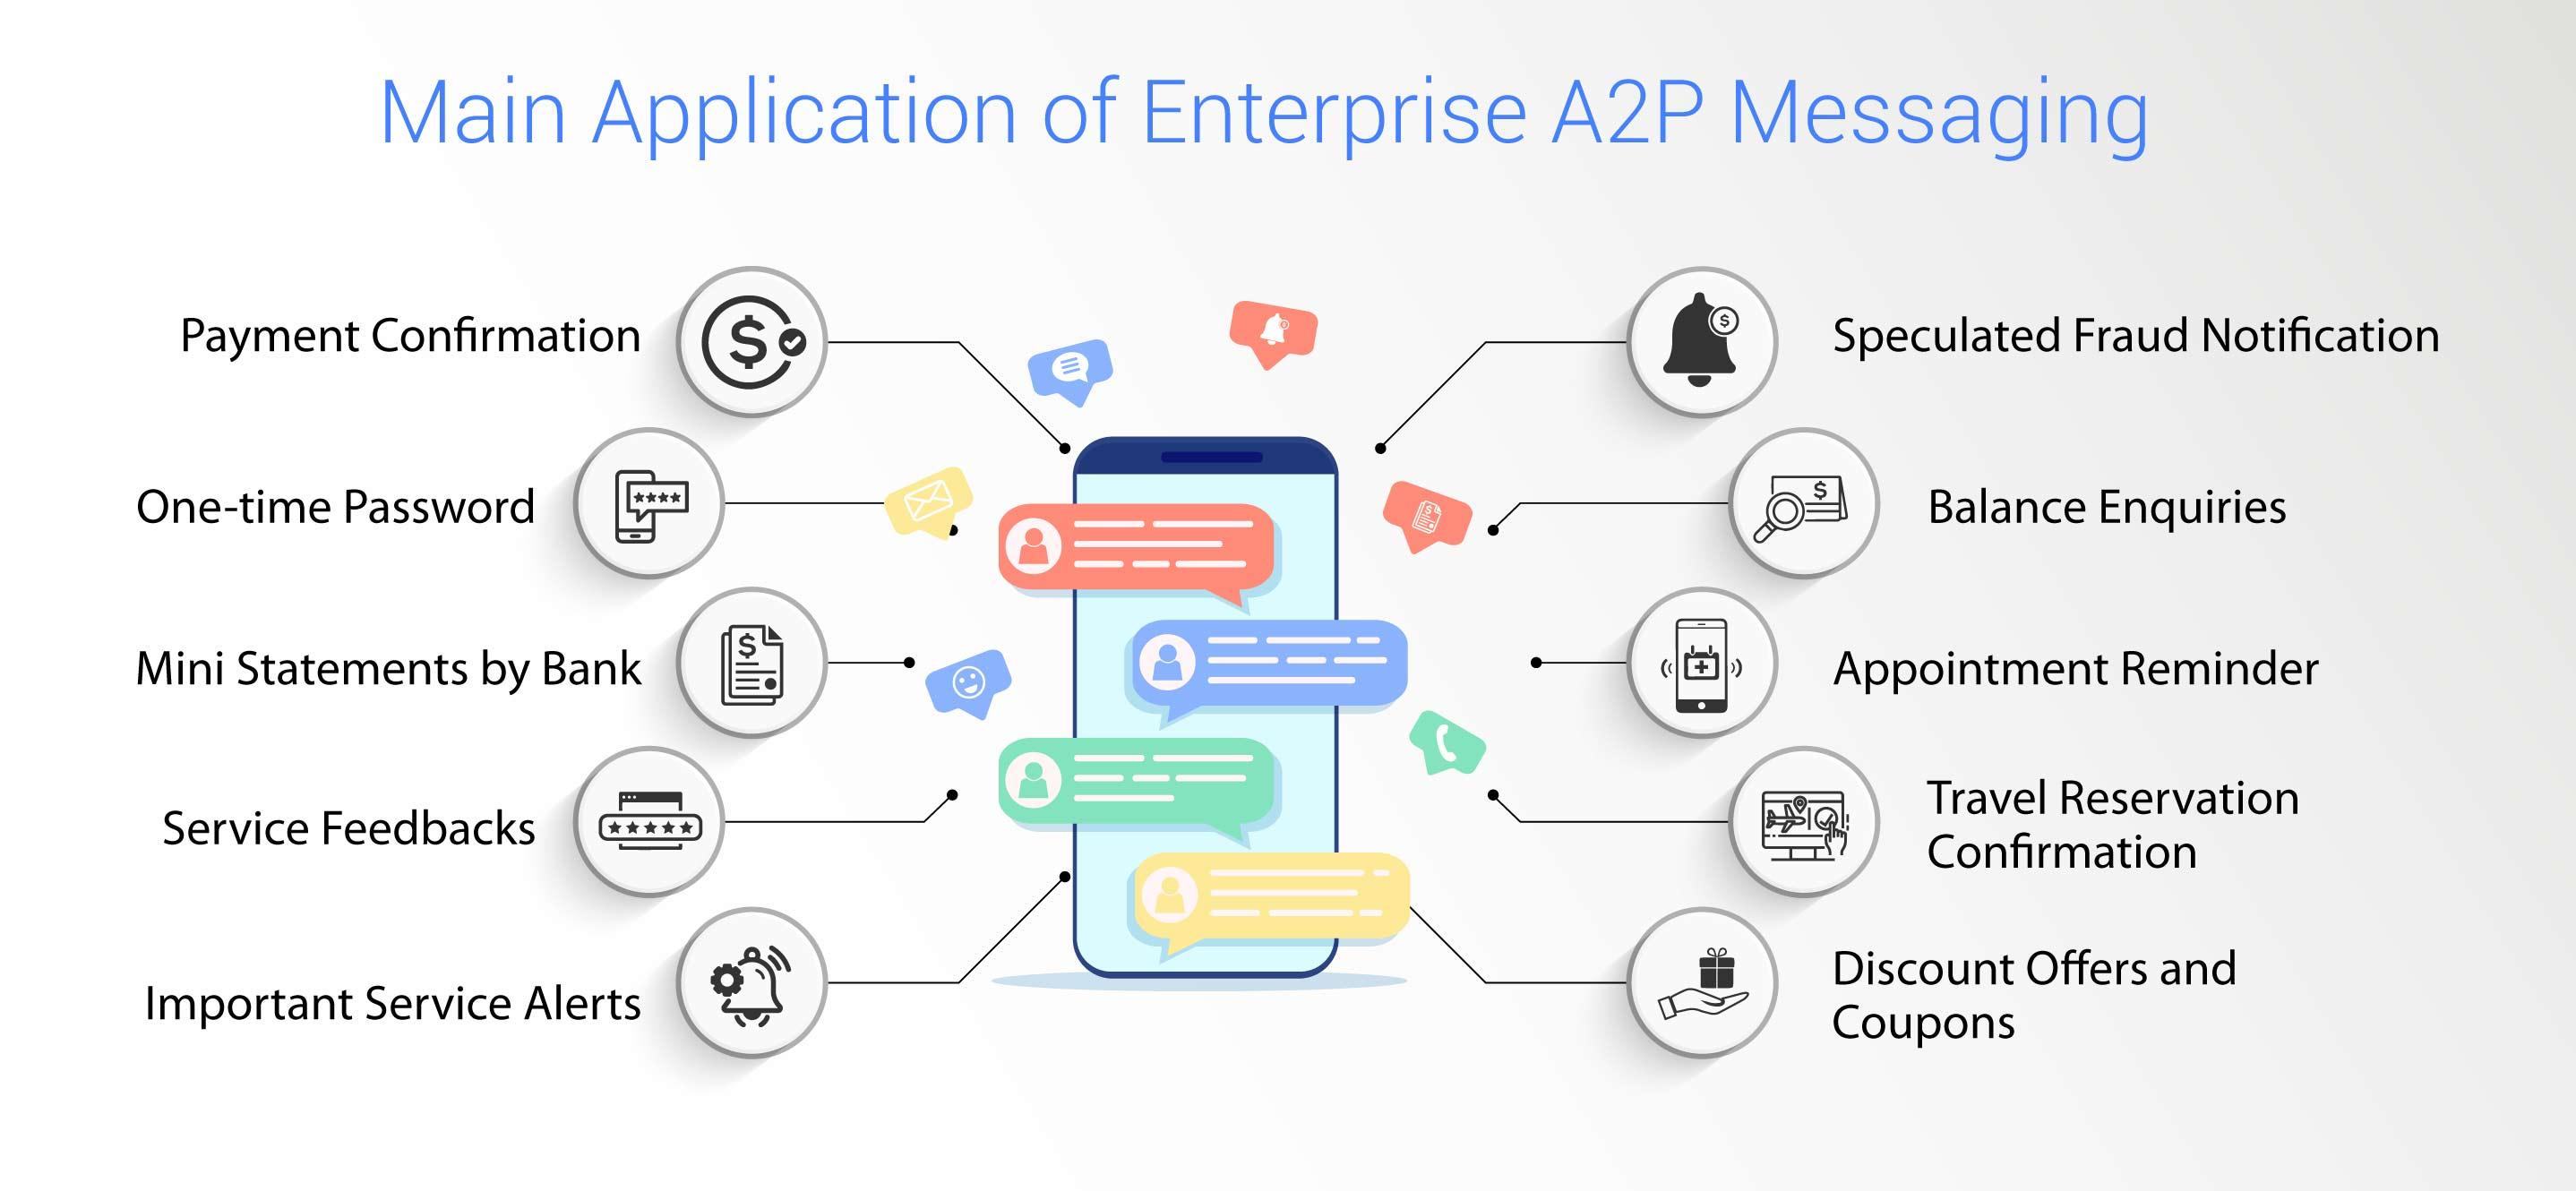 Application of Enterprise A2P messaging